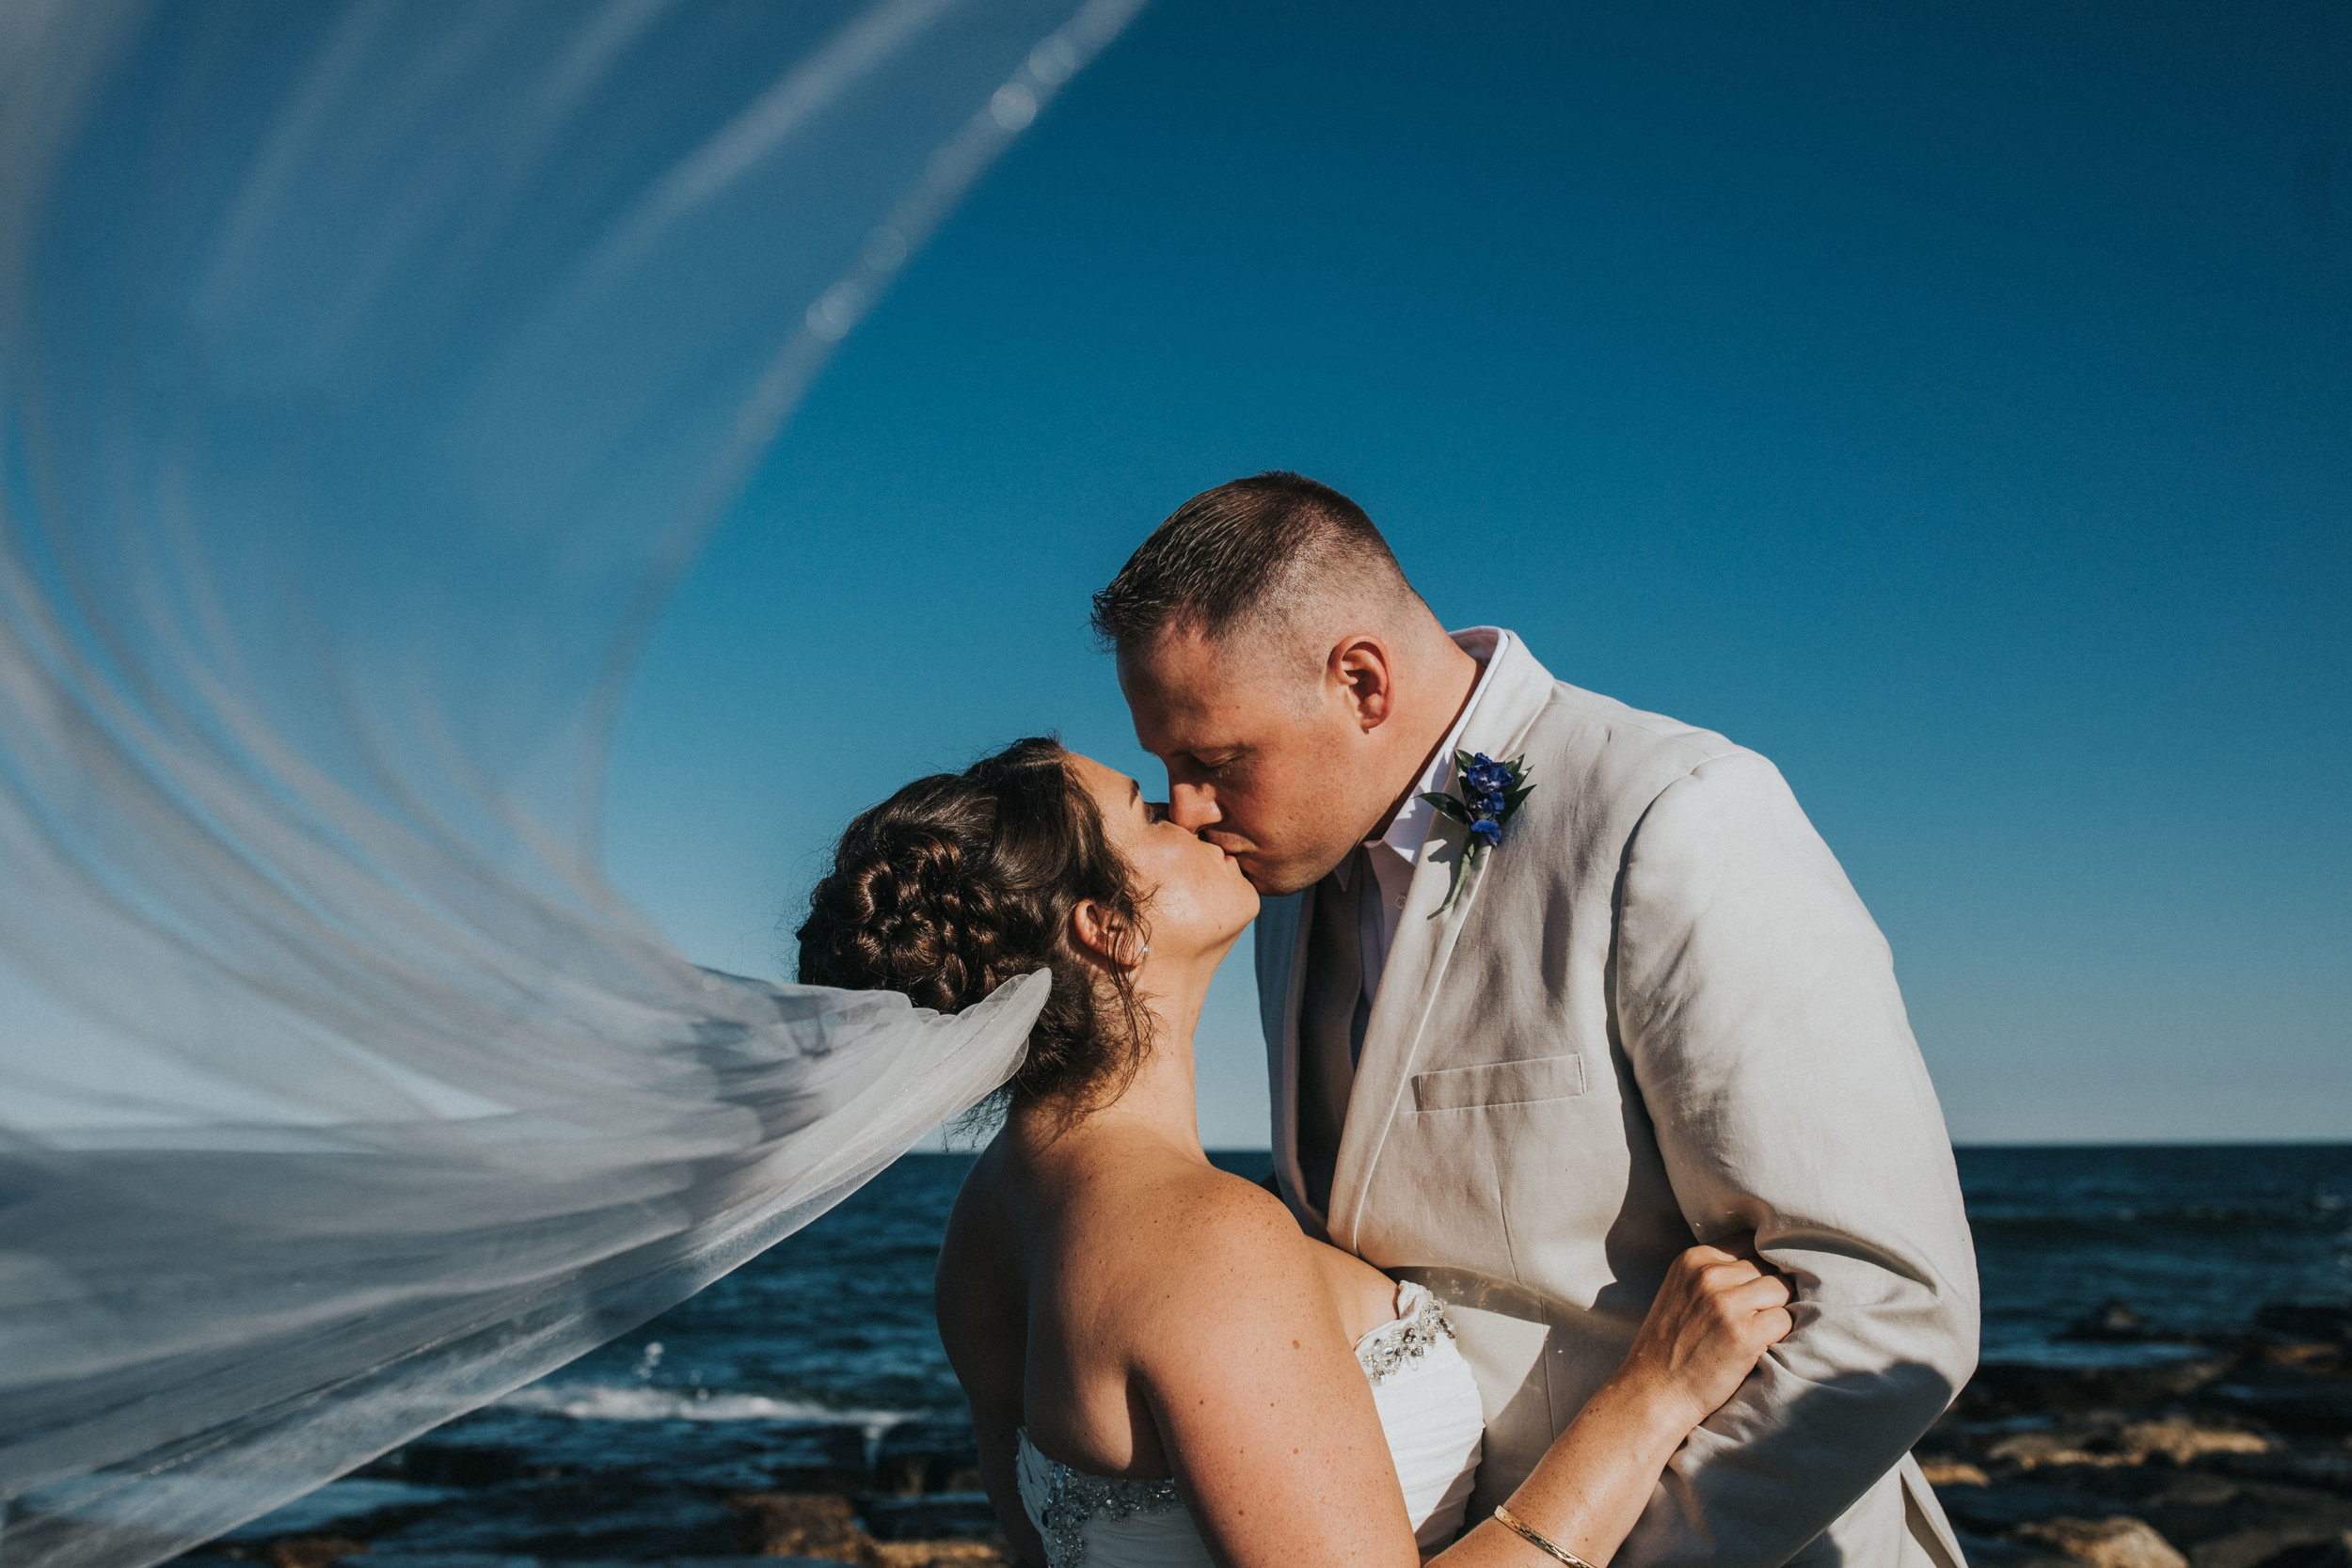 JennaLynnPhotography-NJWeddingPhotographer-Wedding-TheBerkeley-AsburyPark-Allison&Michael-Bride&Groom-74.jpg